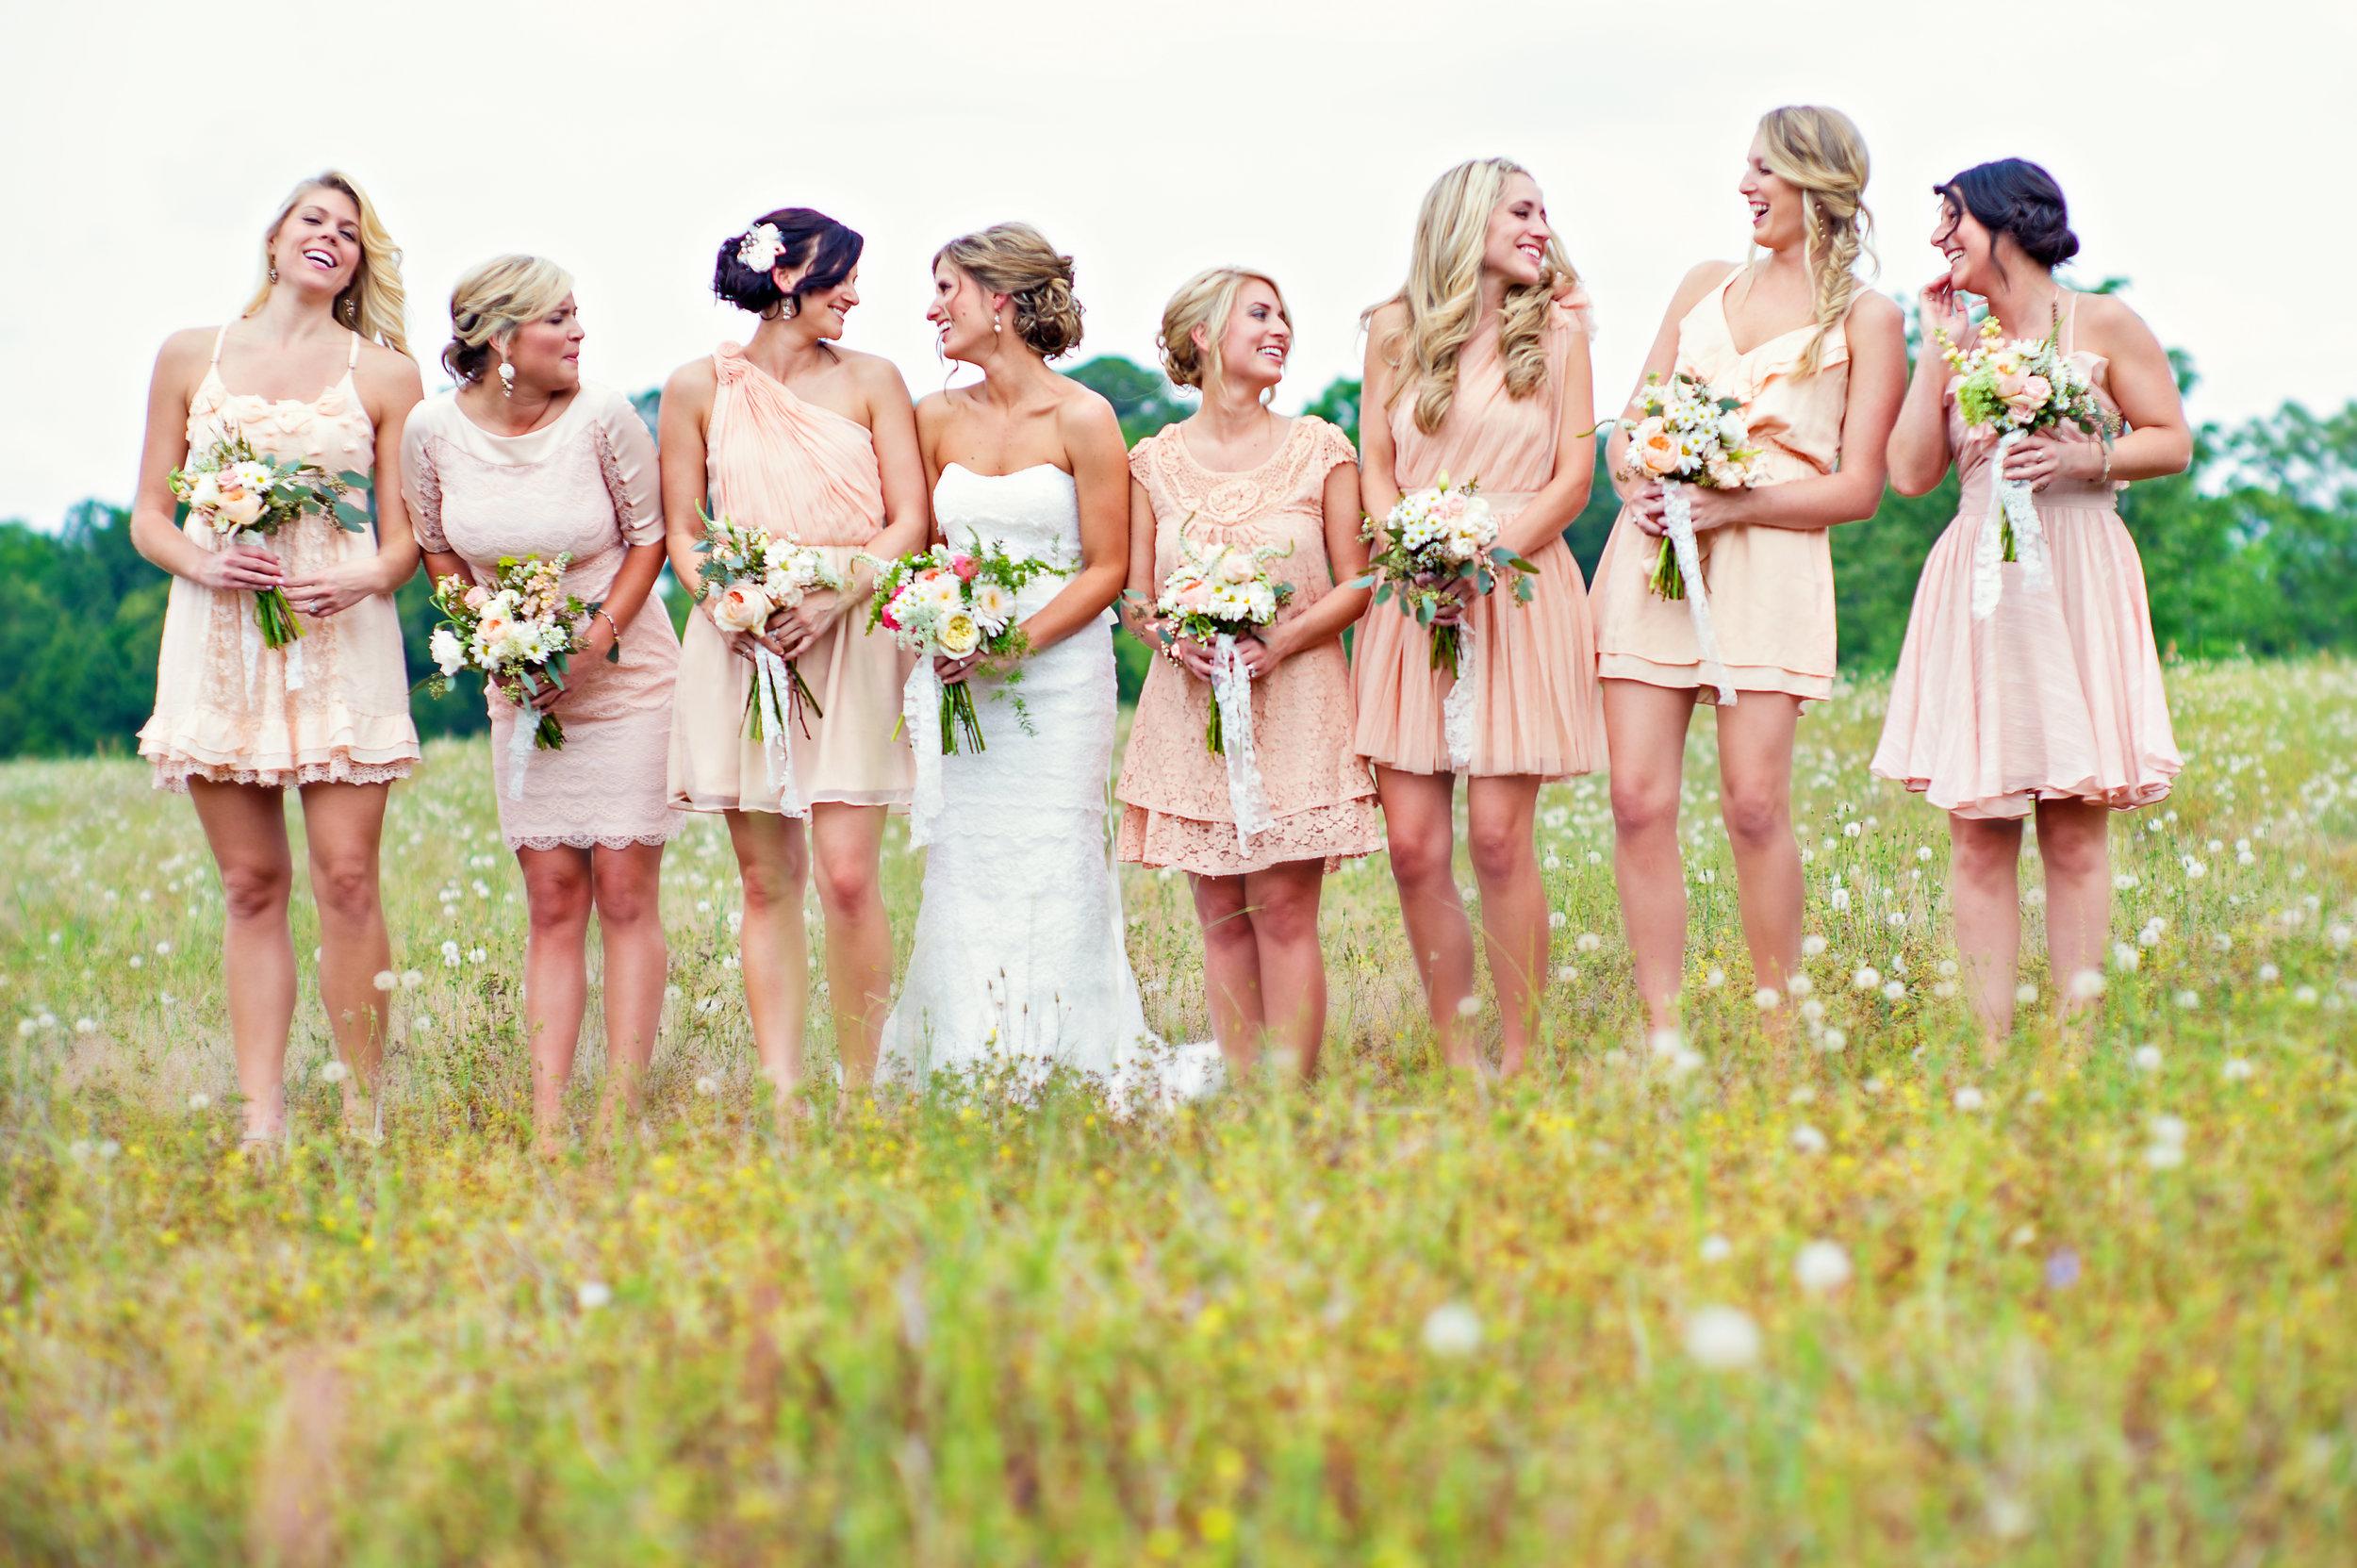 Simply-Charming-Socials_Atlanta-Wedding-Planner_Mismatched-Bridesmaid-Dresses_5.jpg